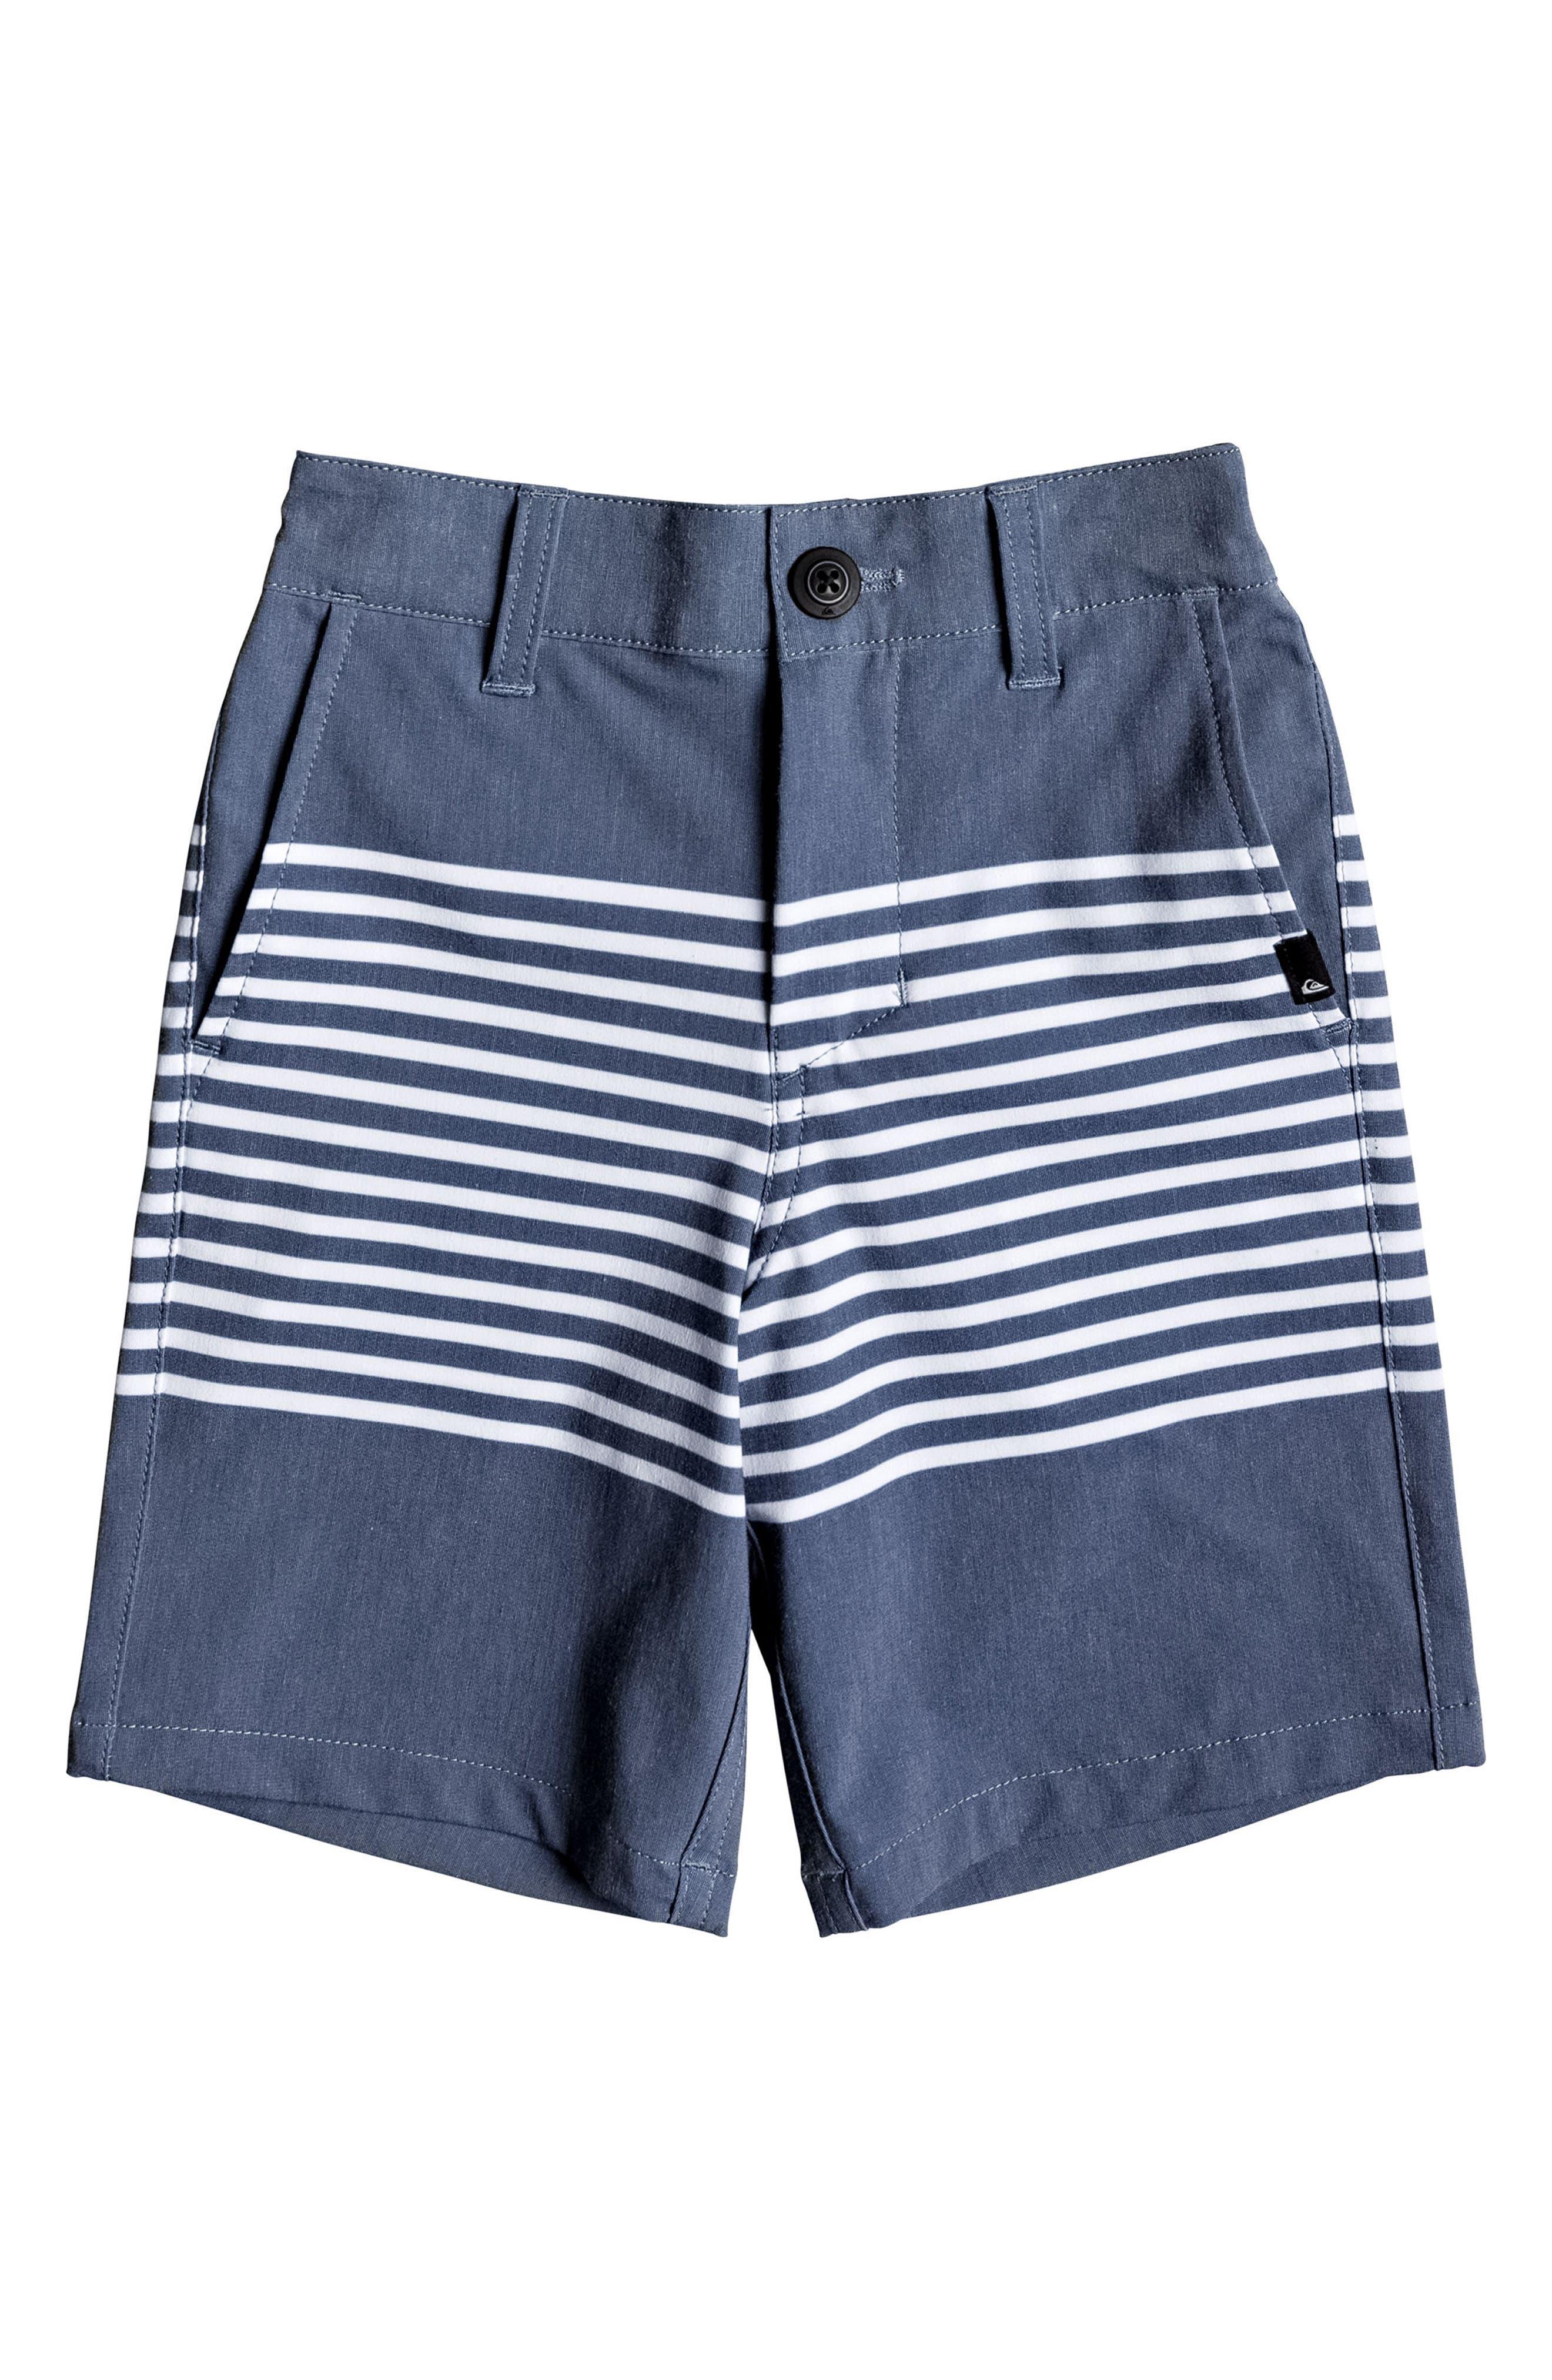 Echo Stripe Amphibian Board Shorts,                             Main thumbnail 1, color,                             401